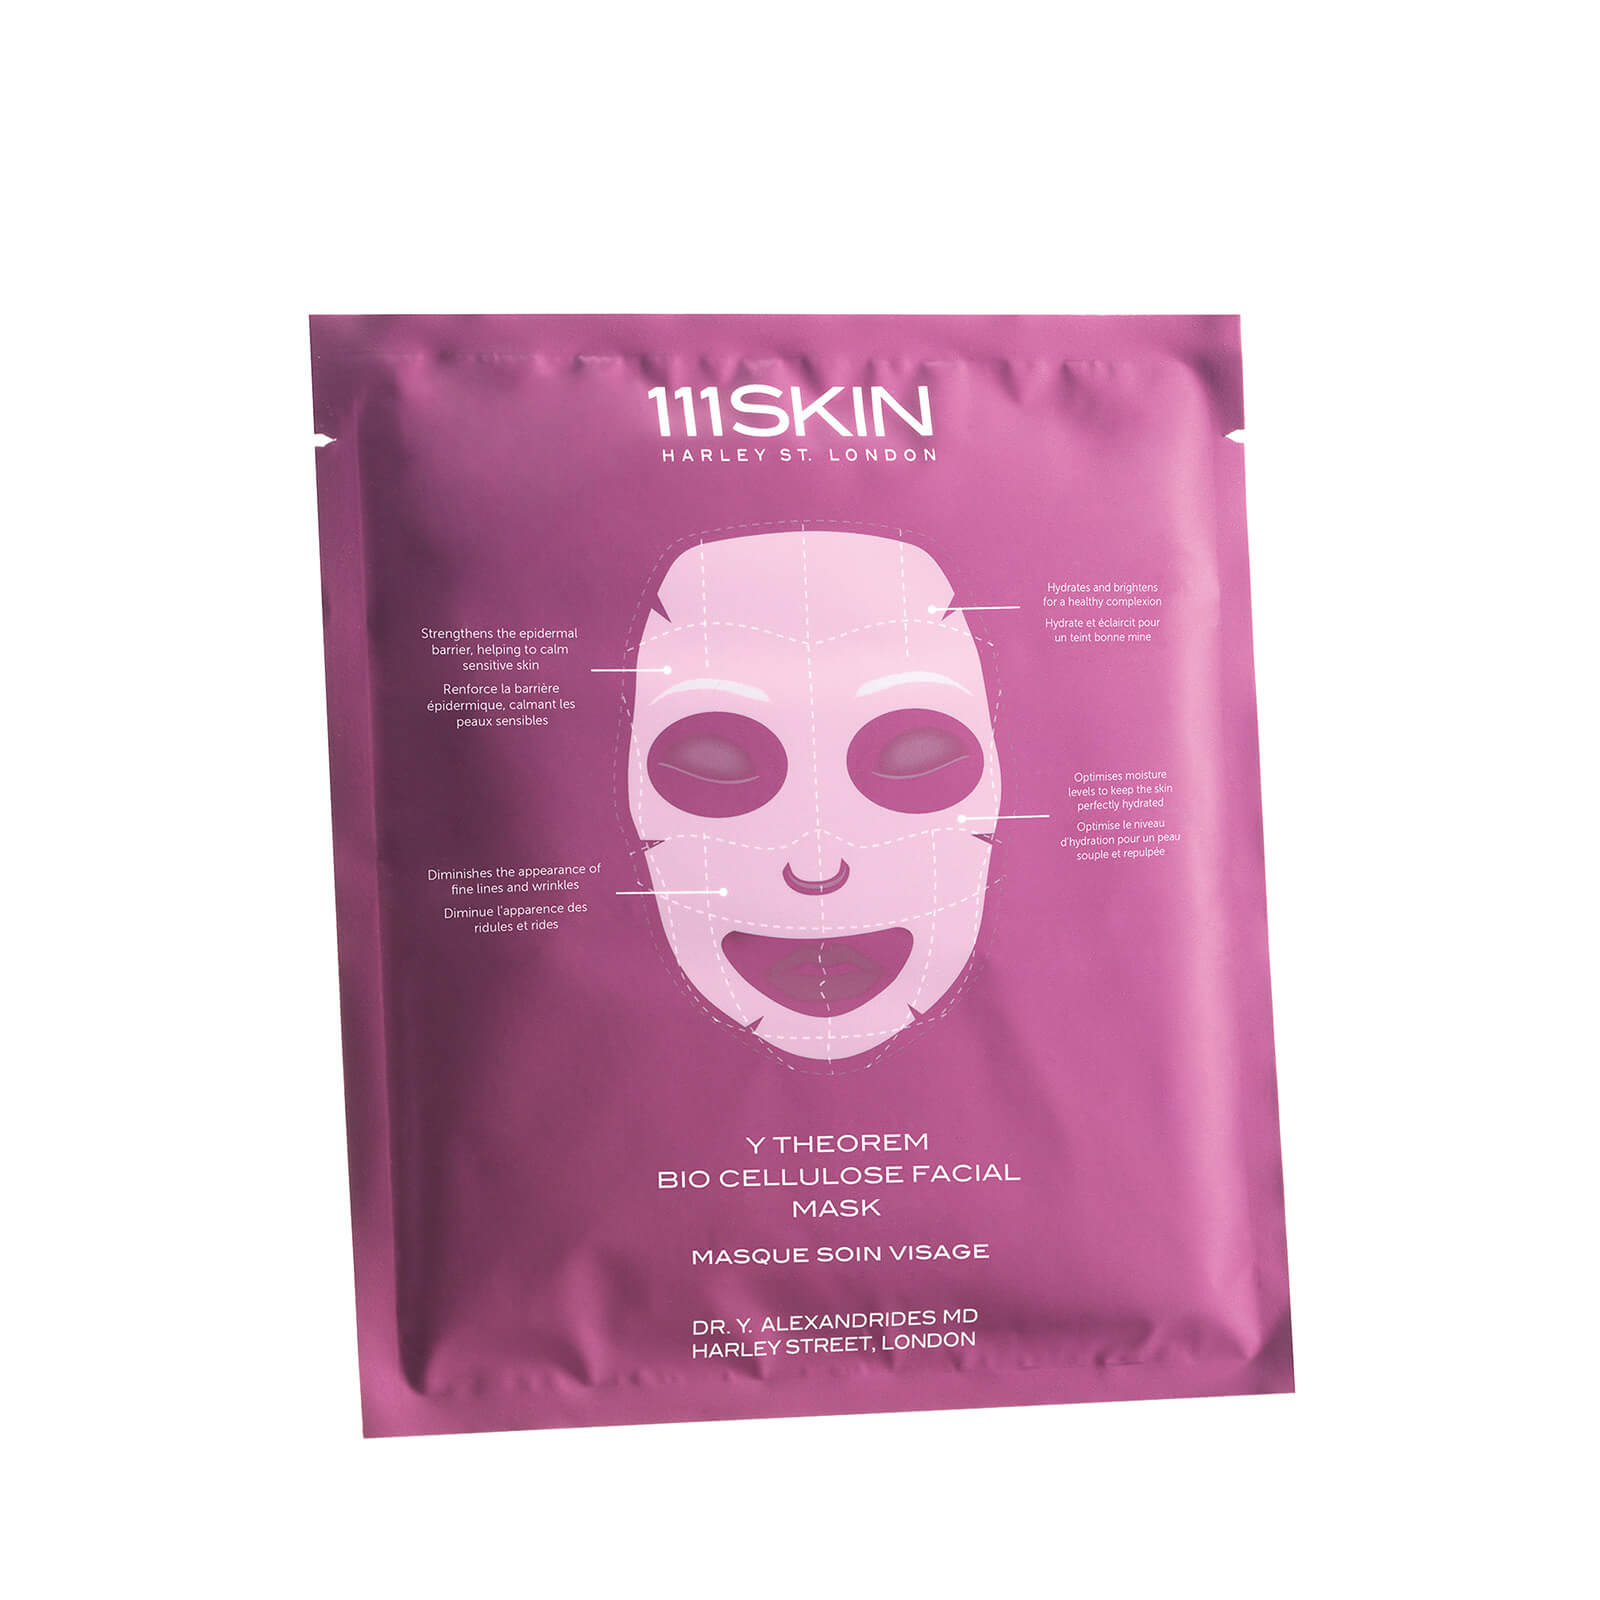 111skin Skincares Y THEOREM BIO CELLULOSE FACIAL MASK BOX